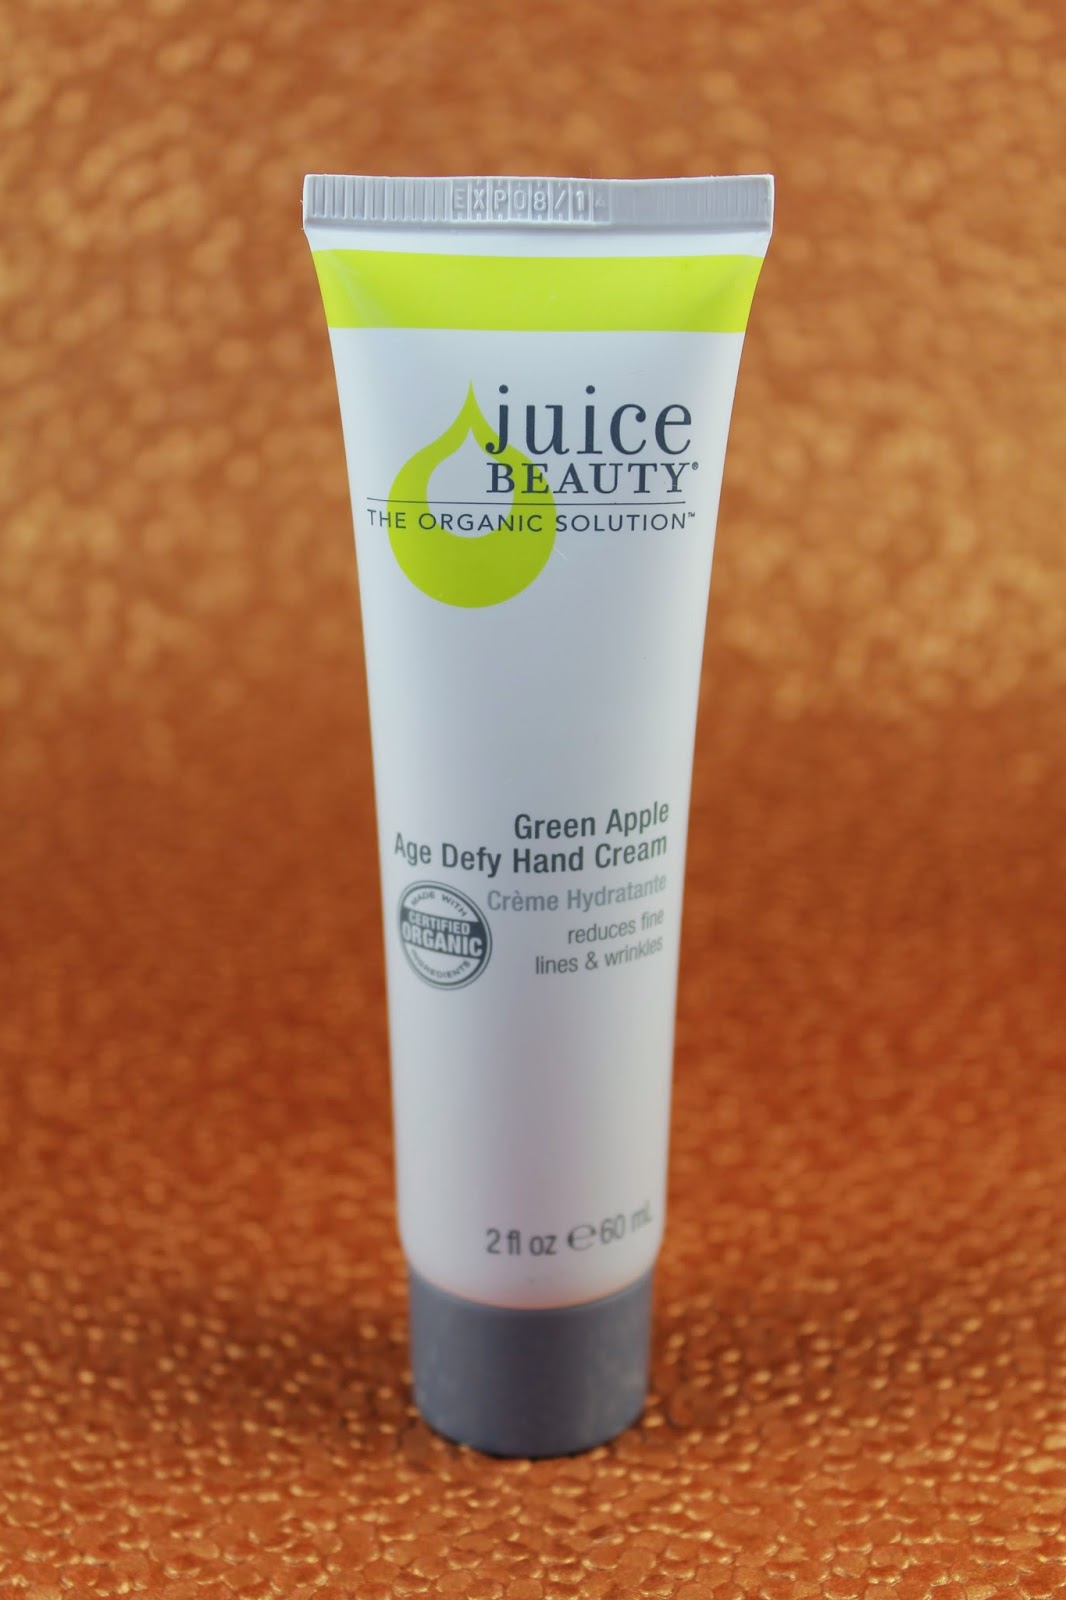 Shine Beauty Beacon M M S Candy Mani: Shine Beauty Beacon: Dry Skin Woes: Punxsutawney Phil